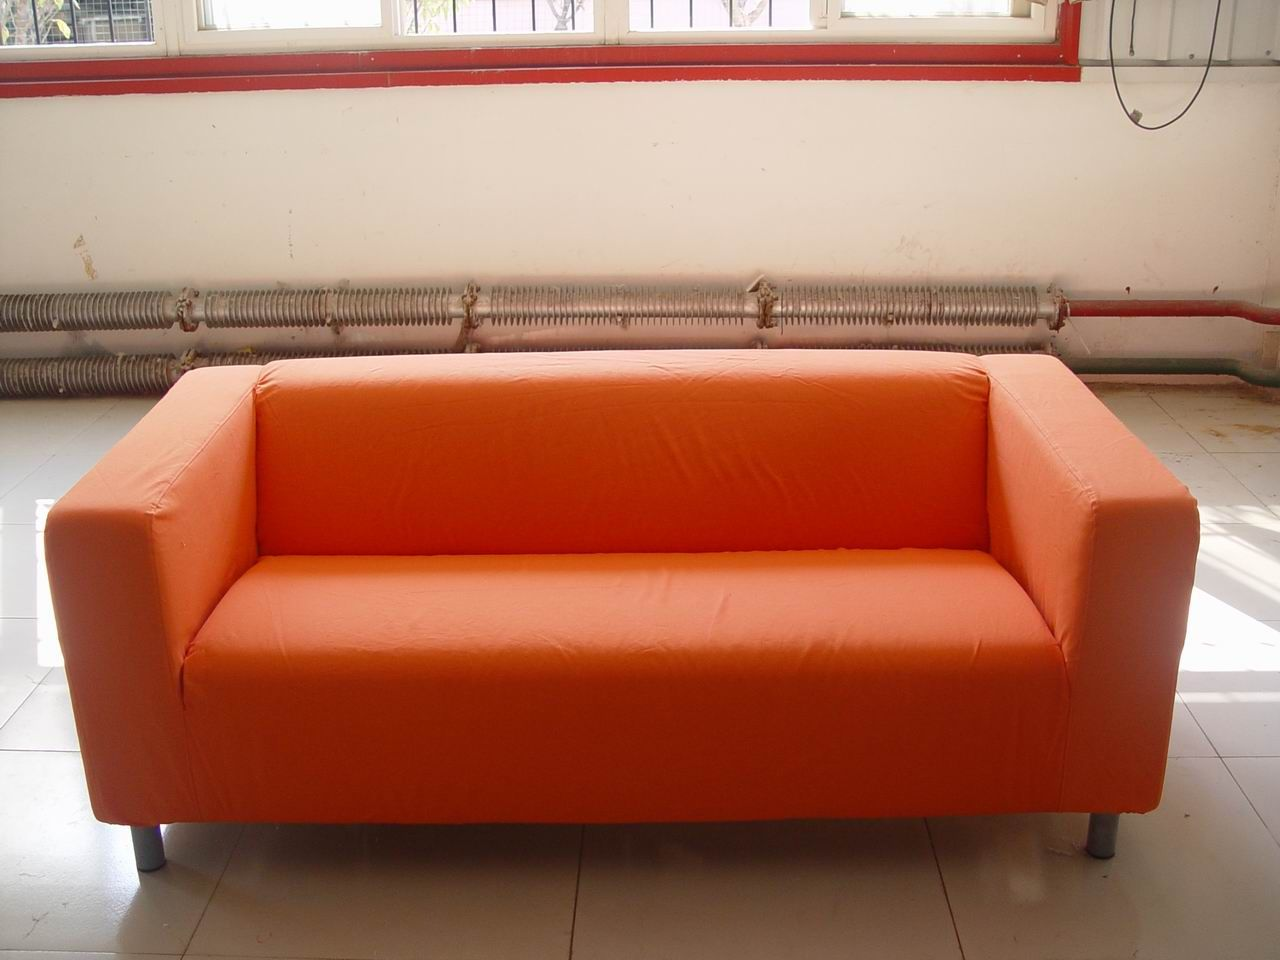 ikea klippan sofa cover red marge carson scarlett 100 cotton canvas fabric jpg 1280